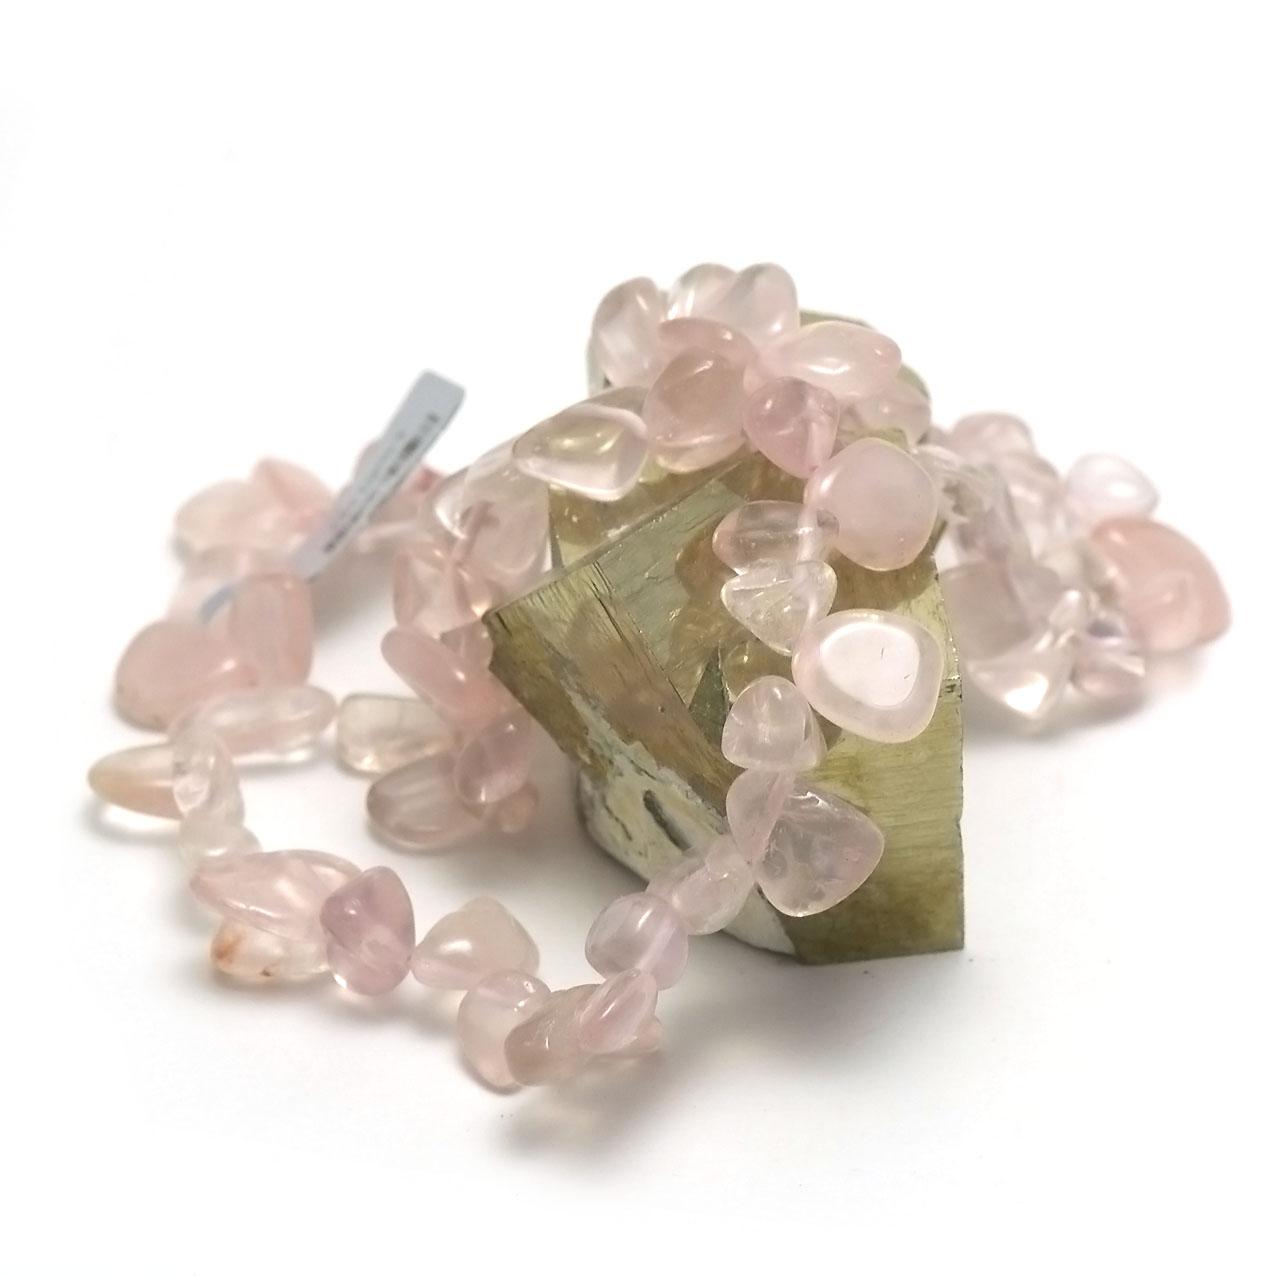 Collier quartz rose  perle TS baroque